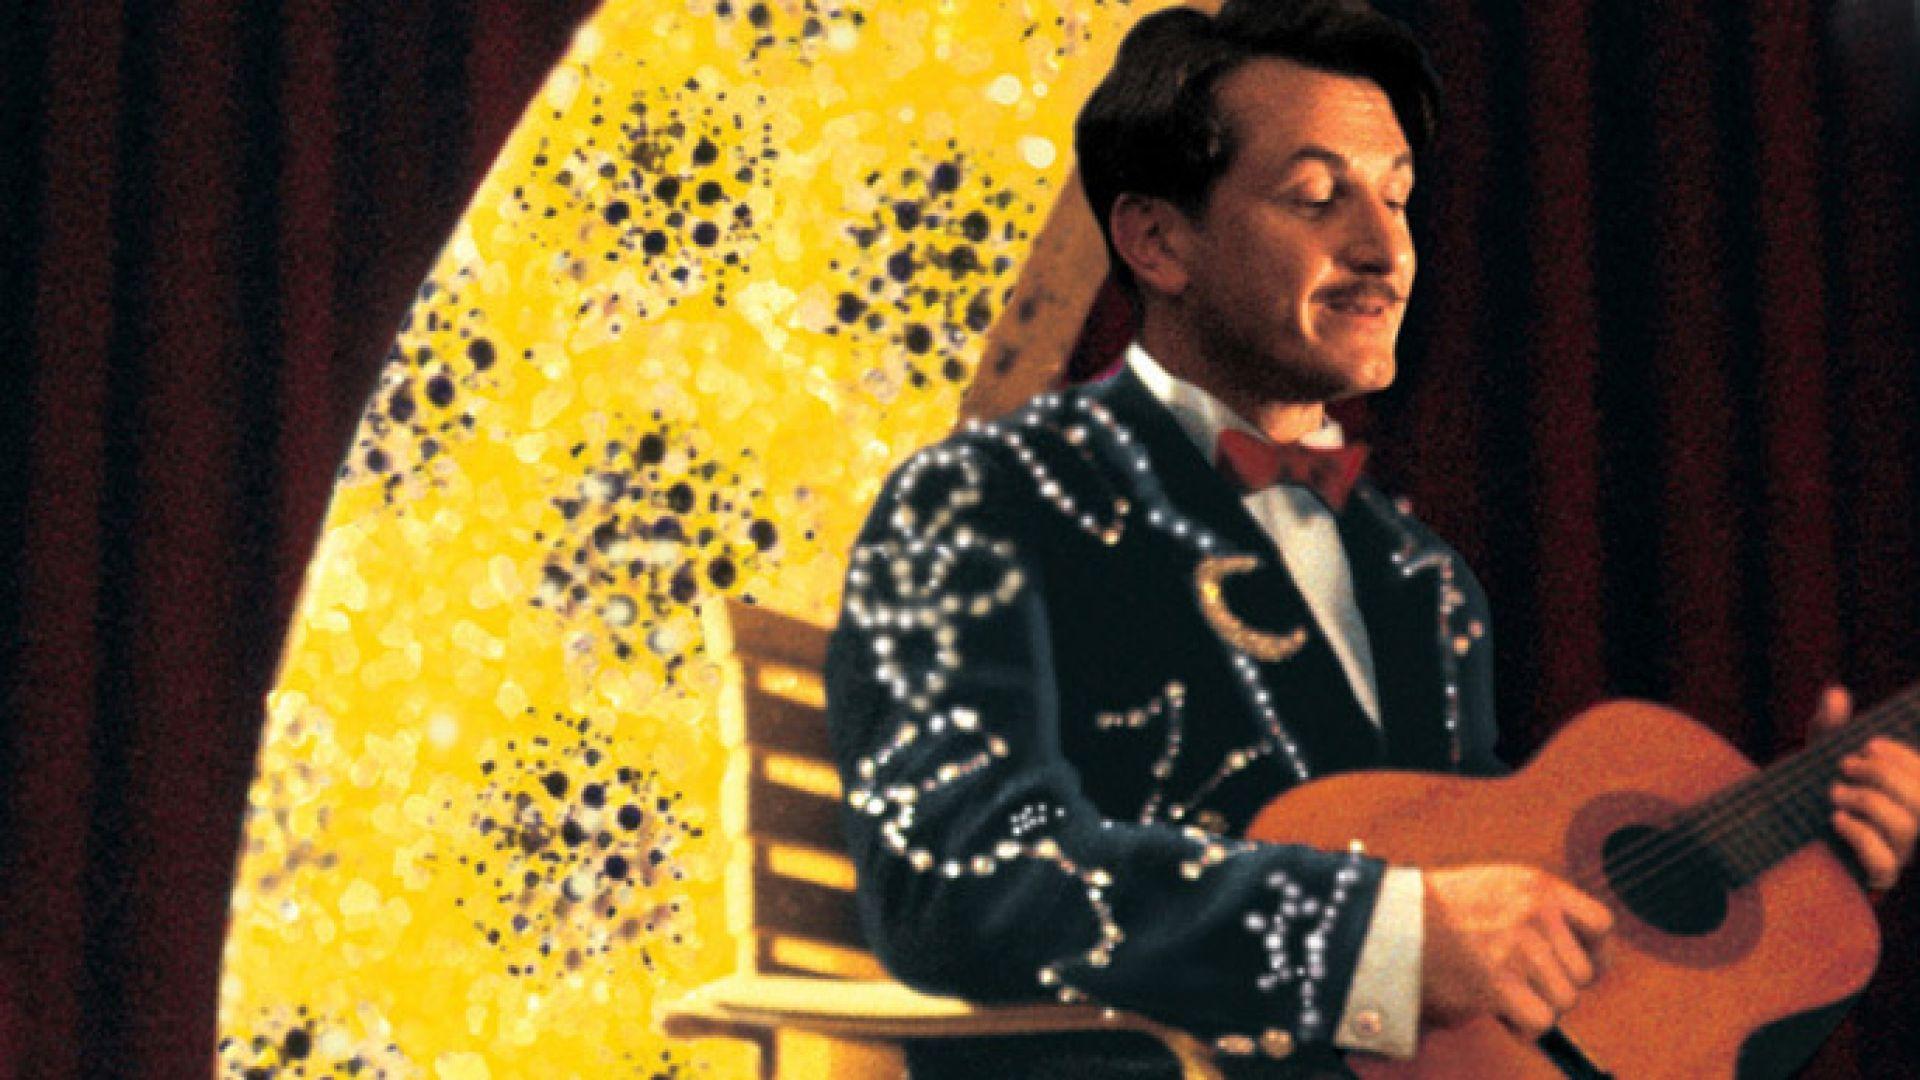 Sean Penn in 'Sweet and Lowdown'